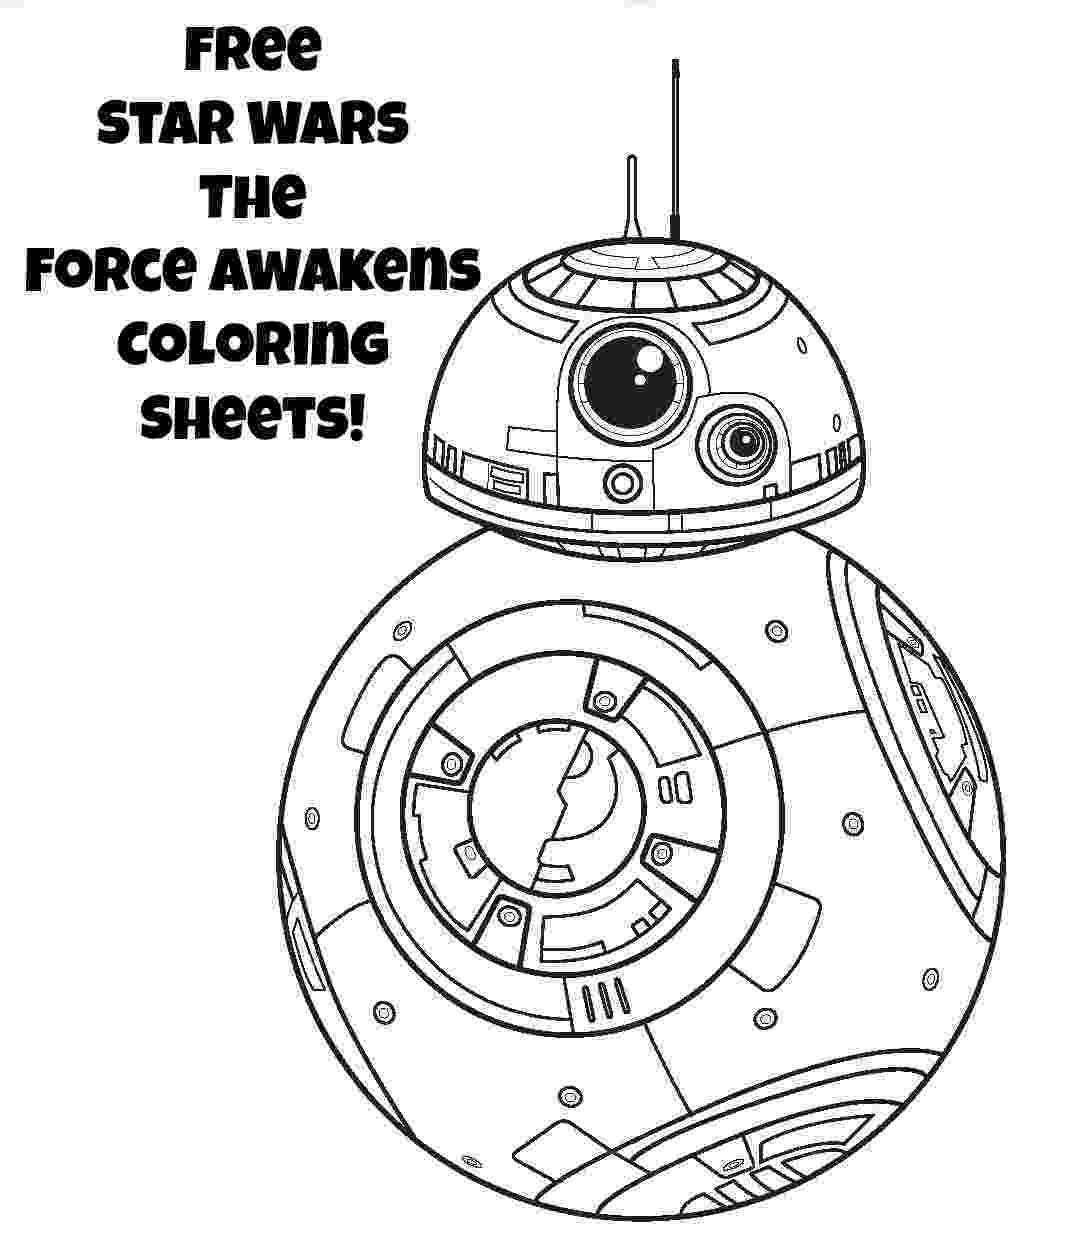 star wars colouring printables star wars free to color for kids star wars kids coloring printables star colouring wars